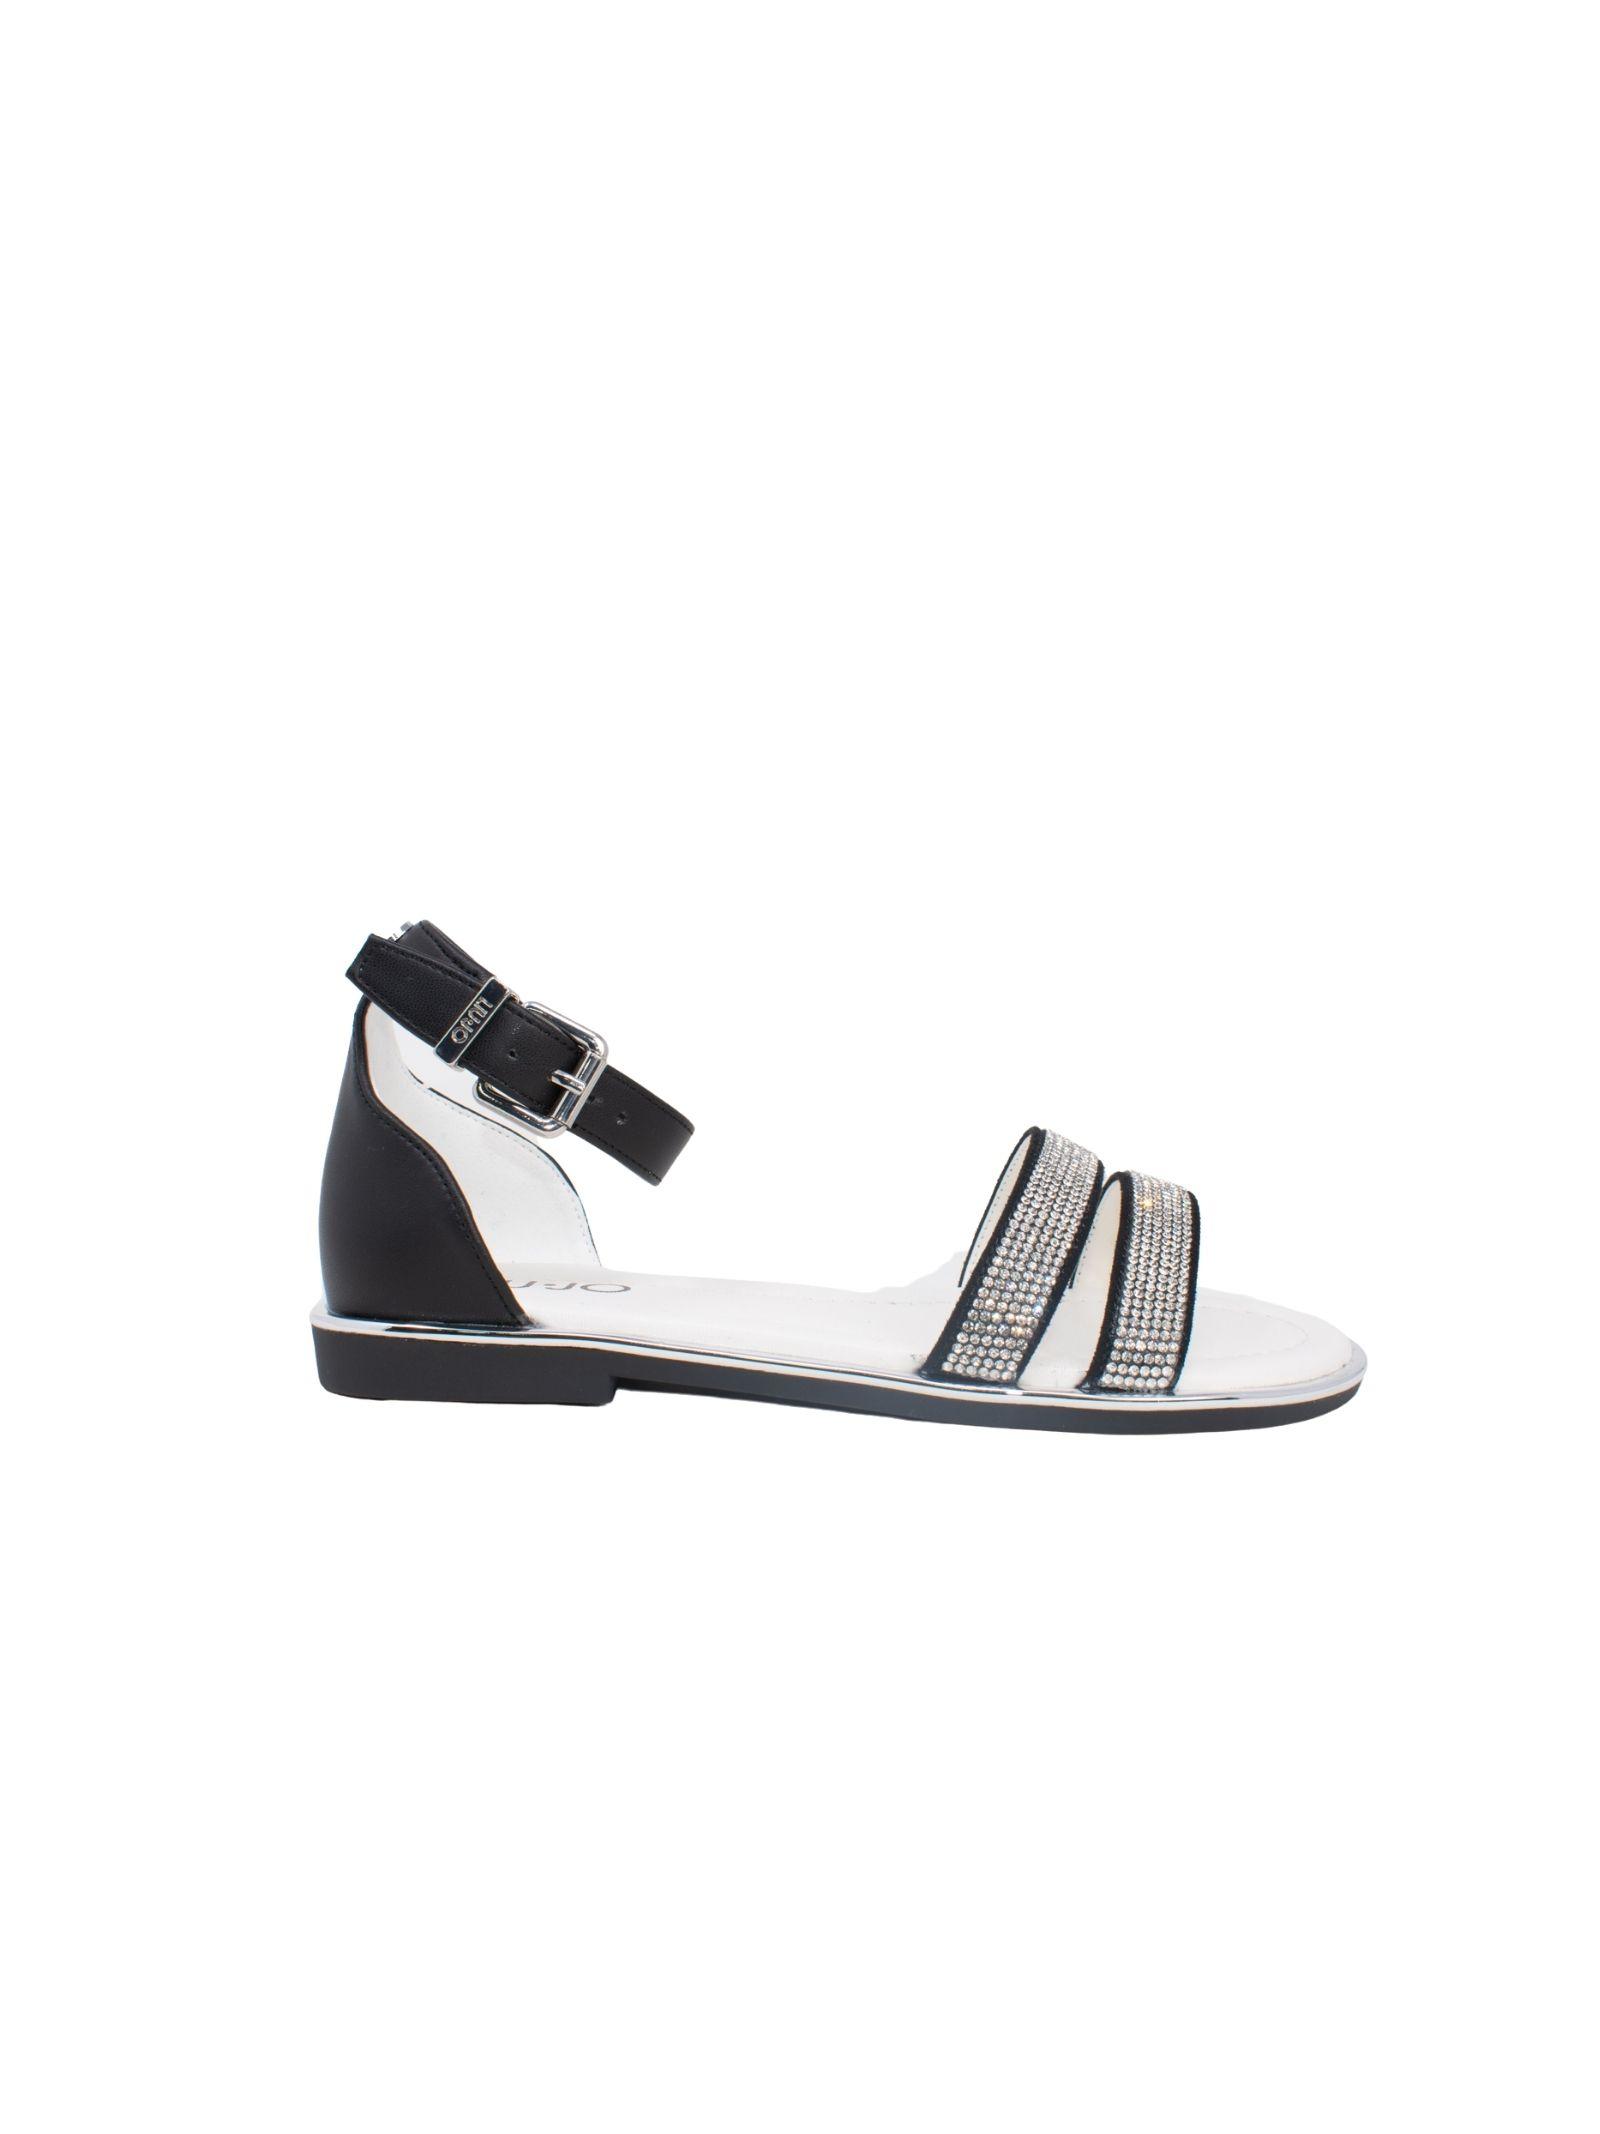 Sandalo Bambina Luxry LIU-JO JUNIOR | Sandali | 4A1715EX08422222NERO